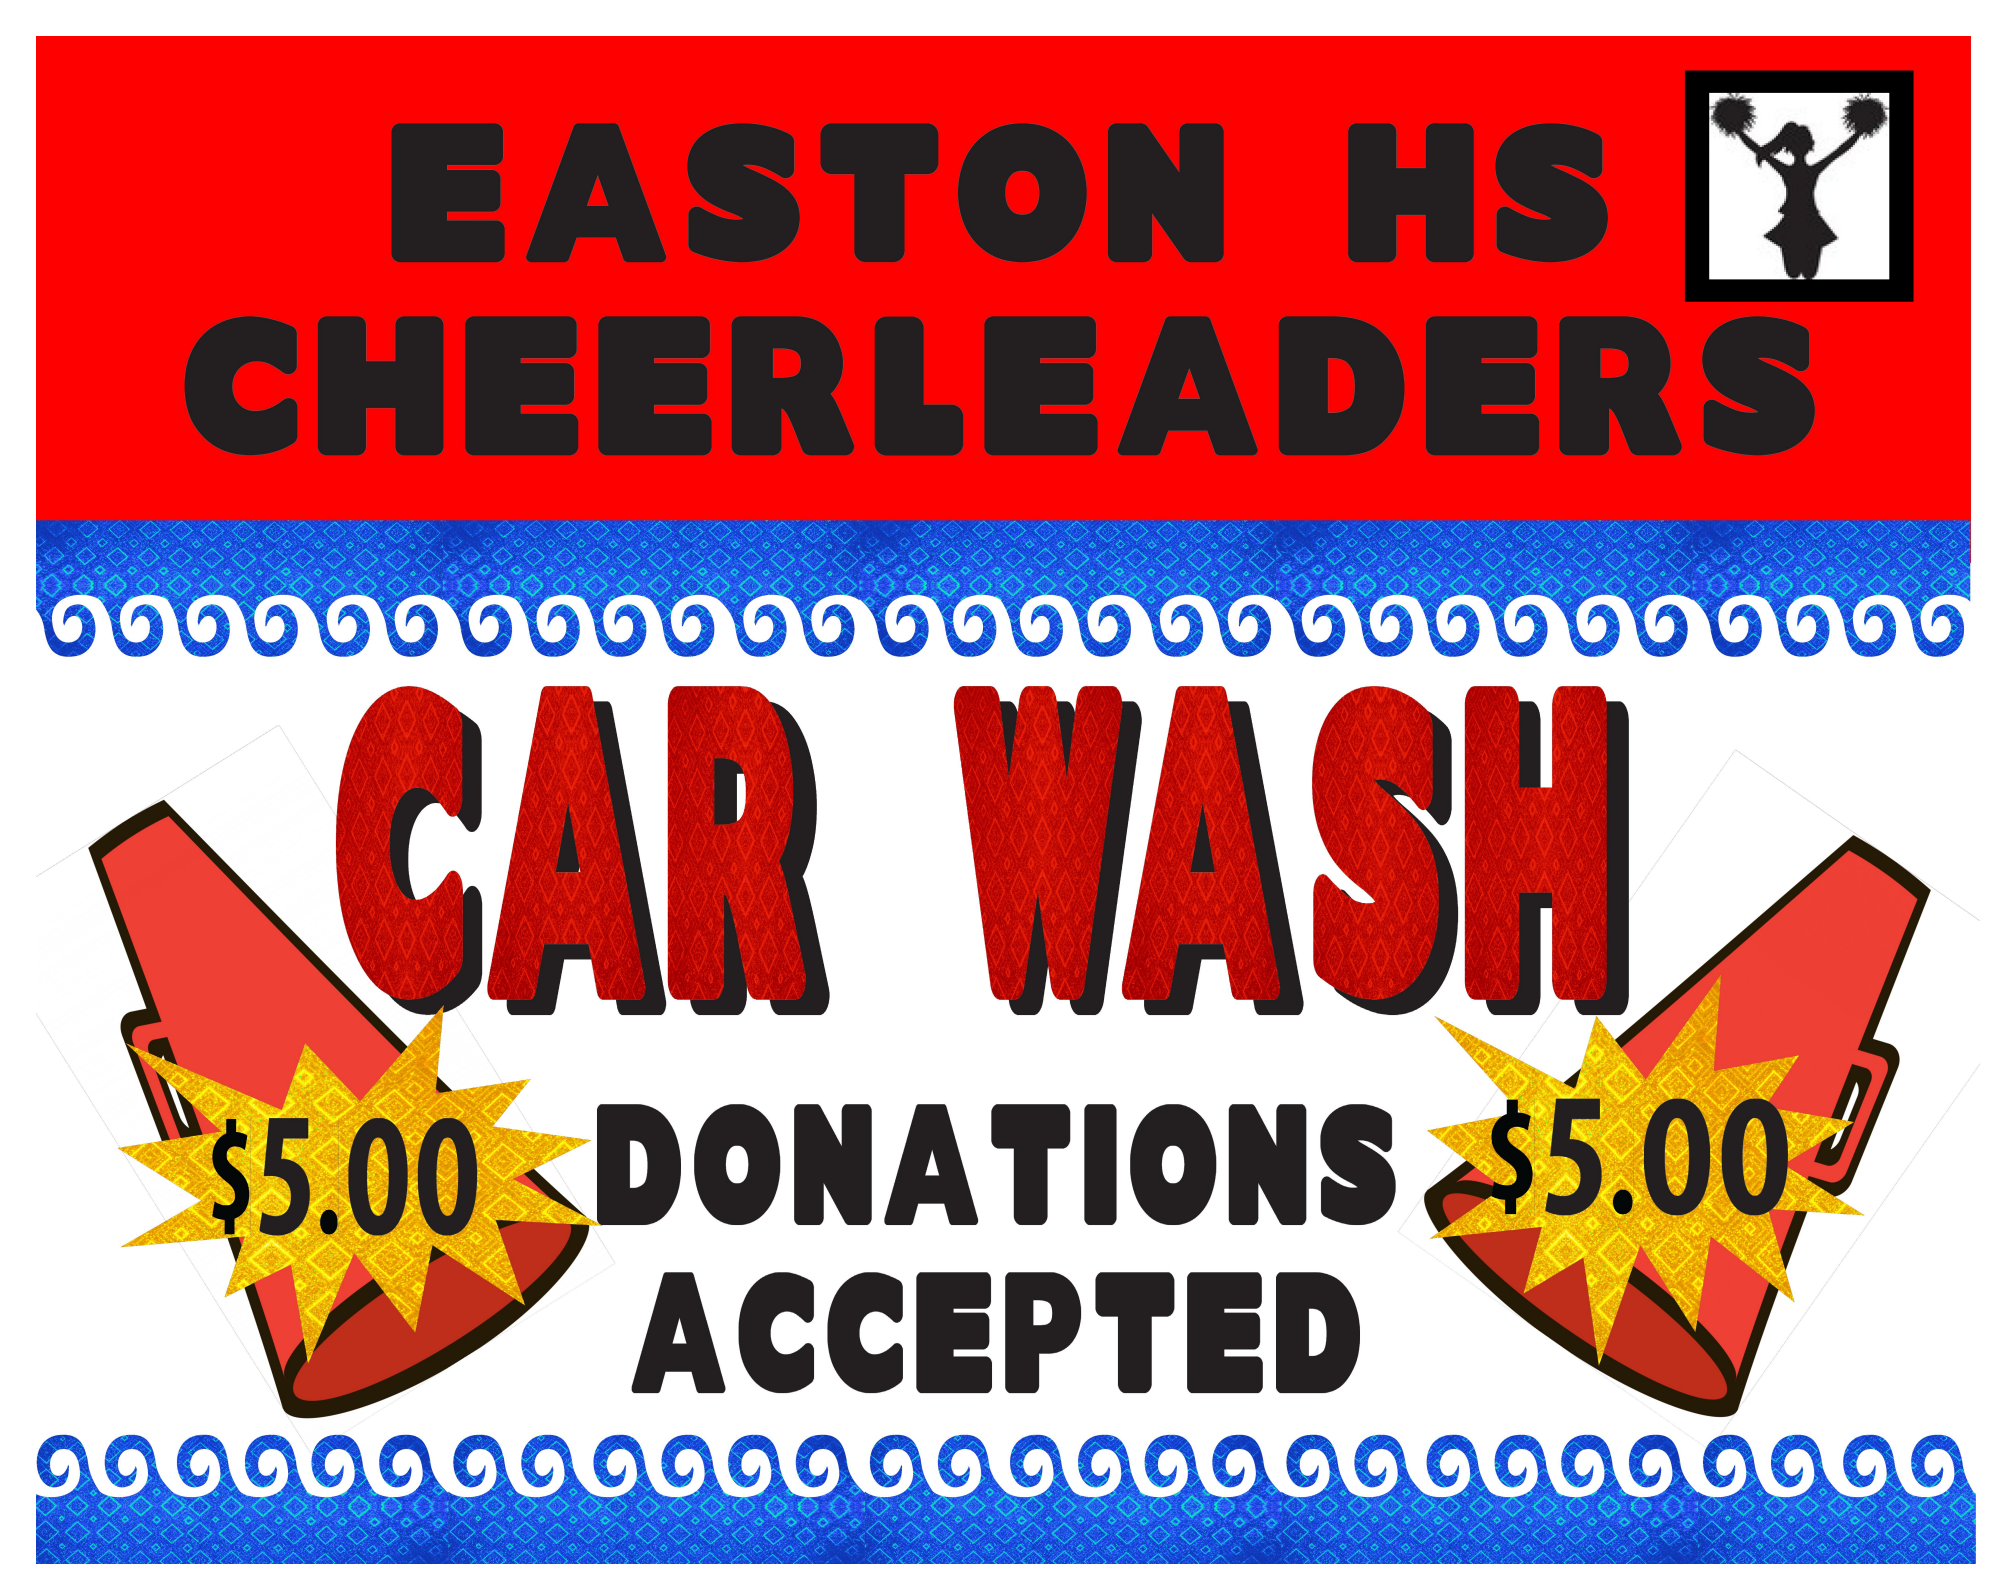 Cheerleader Car Wash Fundraiser Sign Ideas